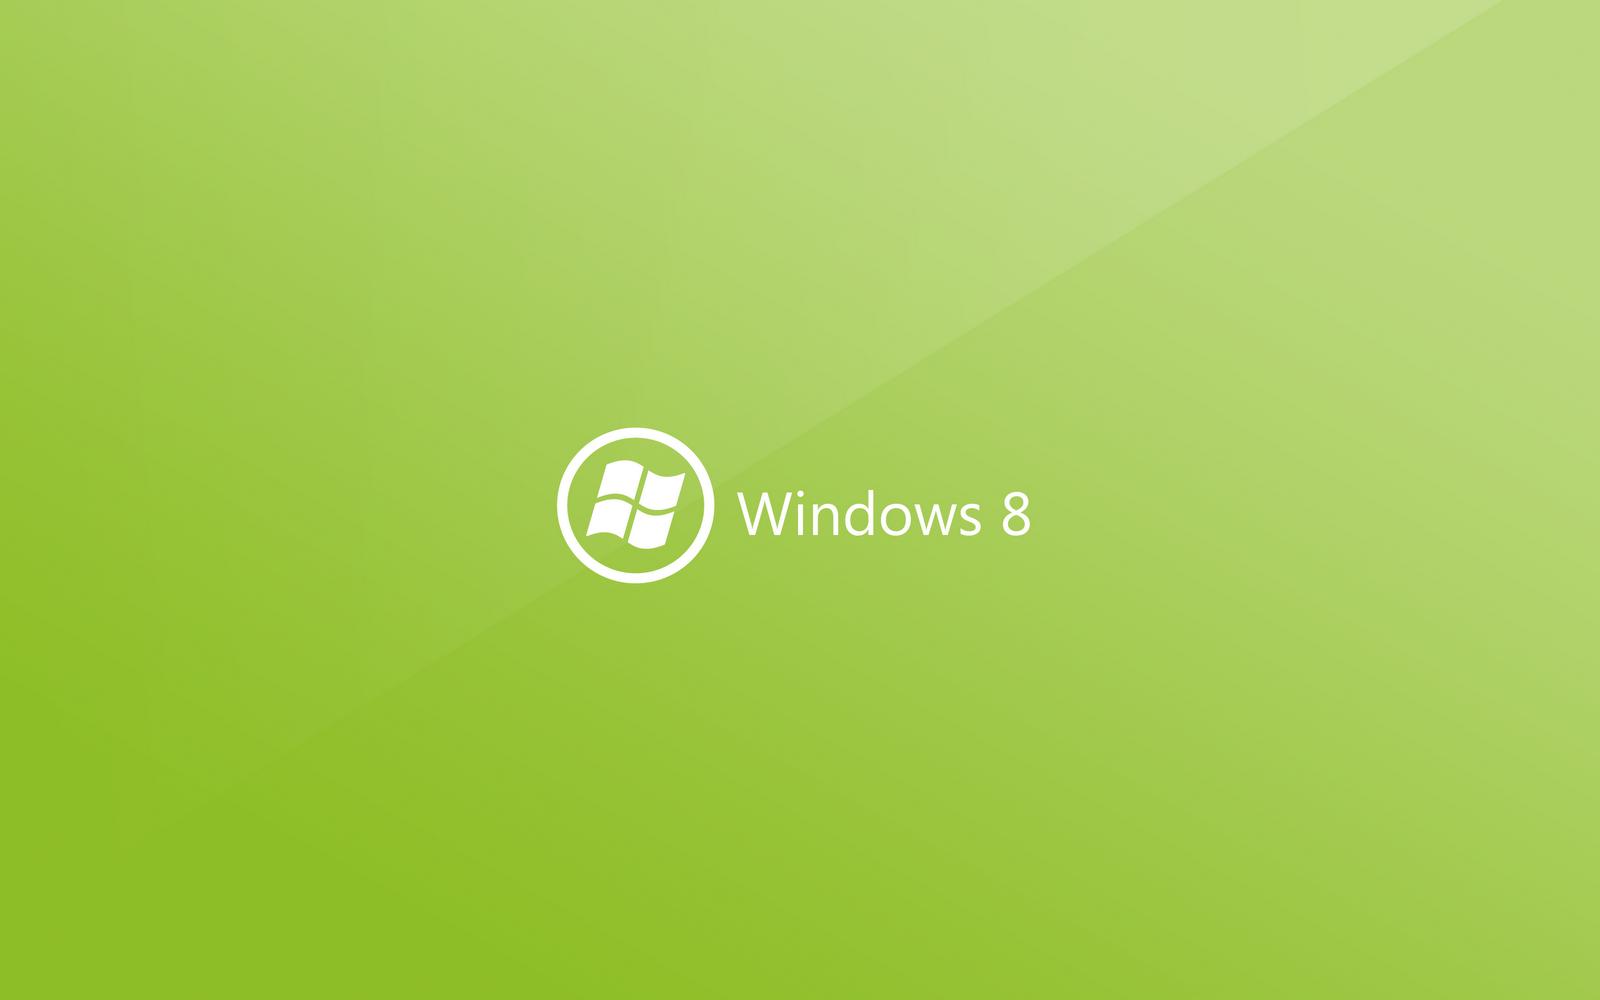 23 Windows 8 Wallpapers